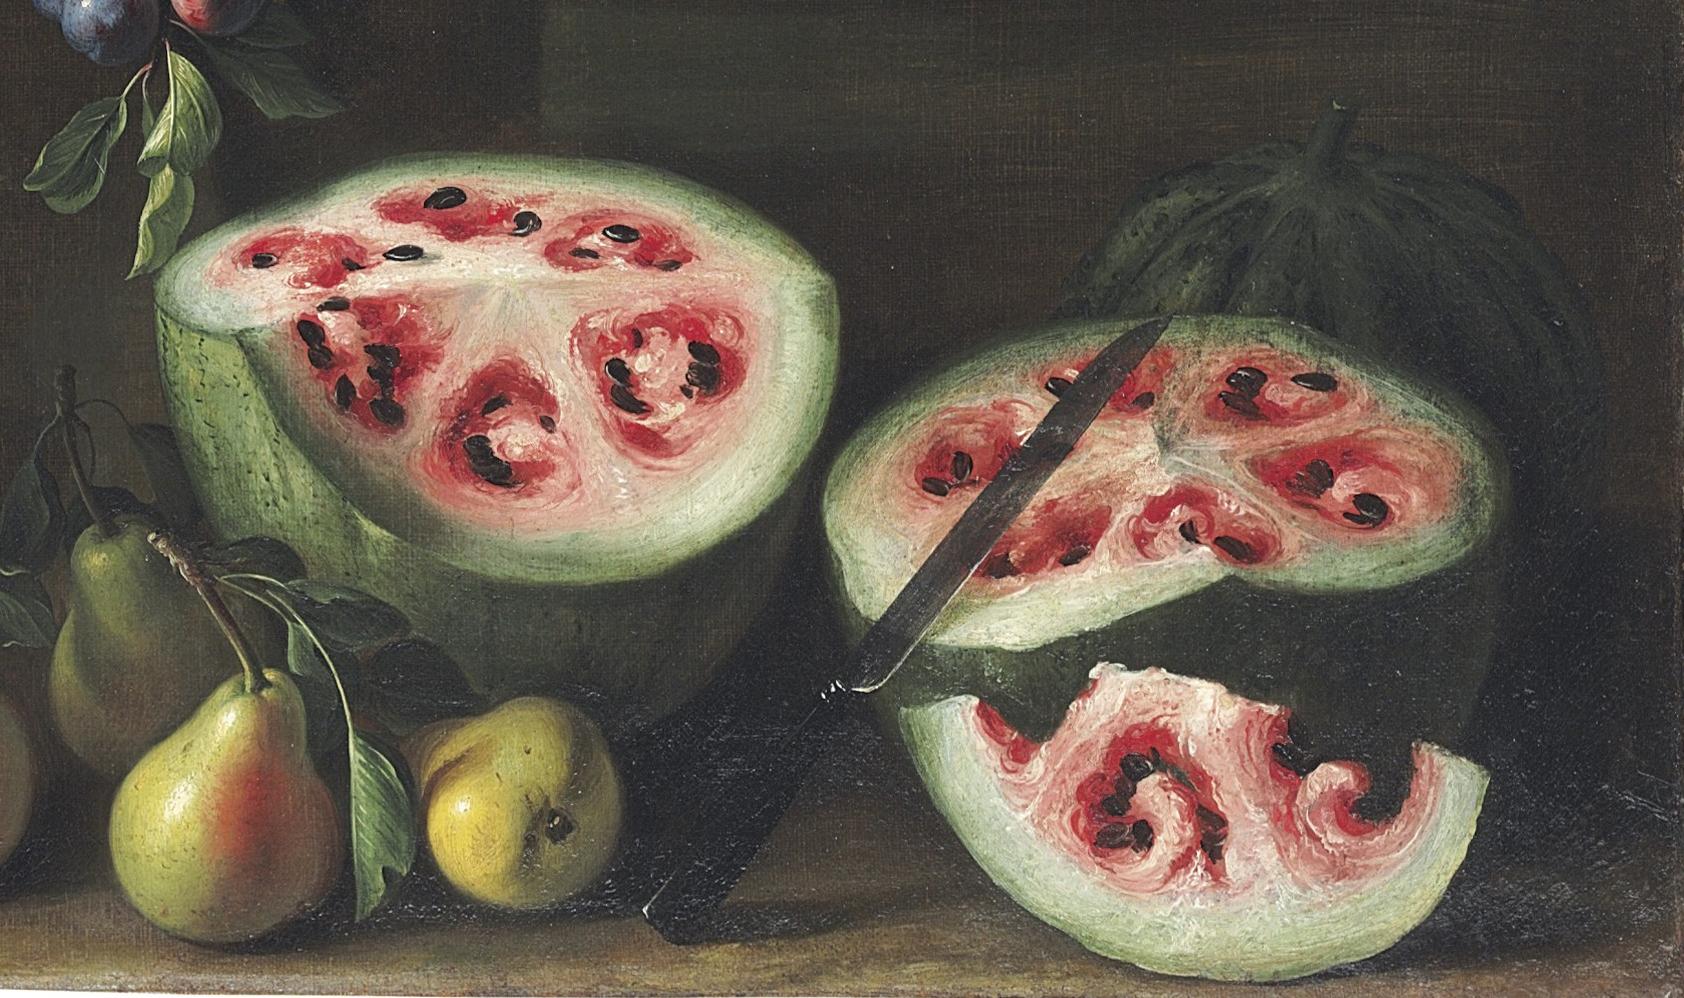 Undomesticated watermelon